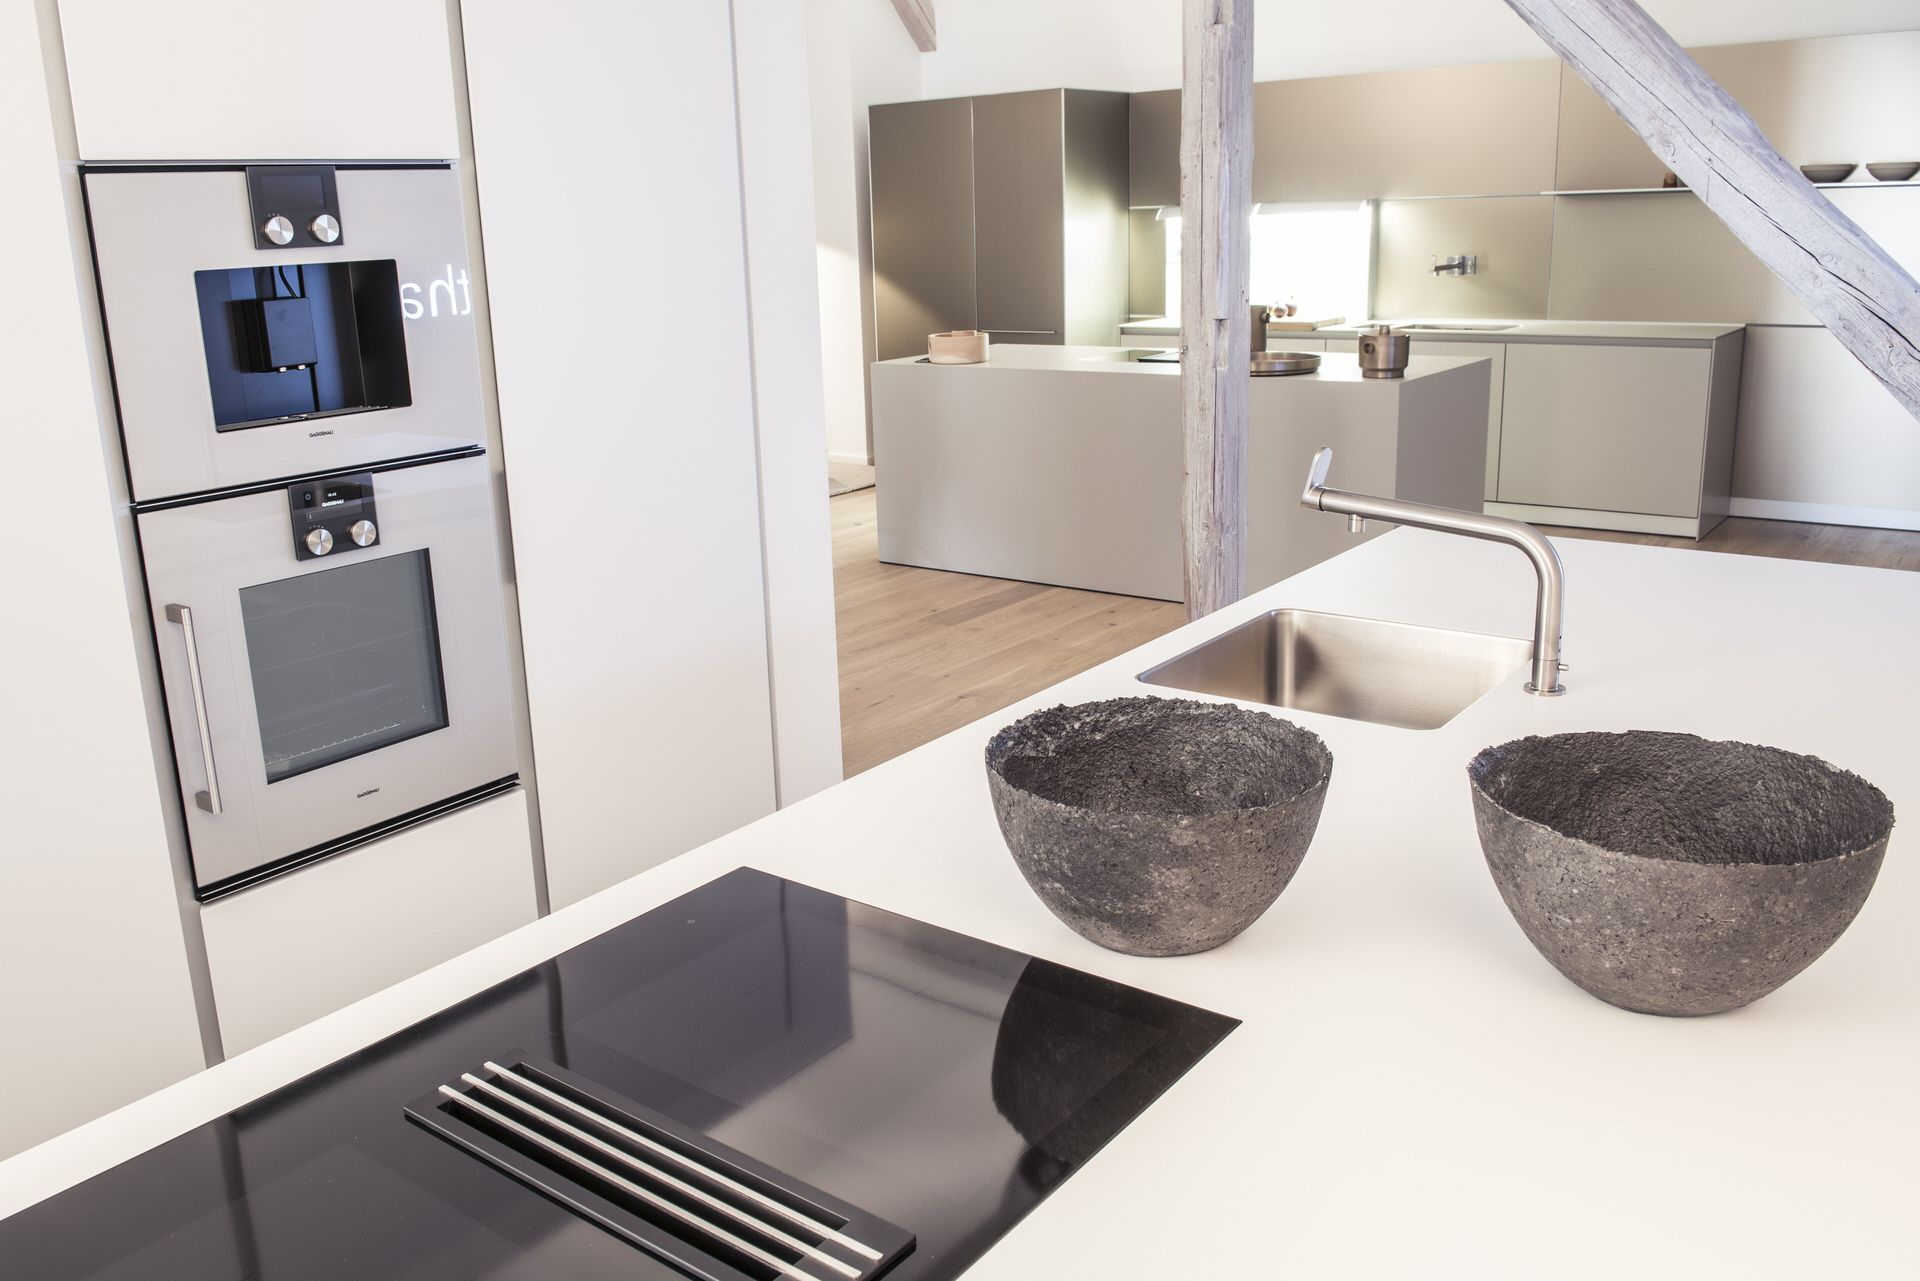 73 Prachtig Kuchenstudio Nurnberg